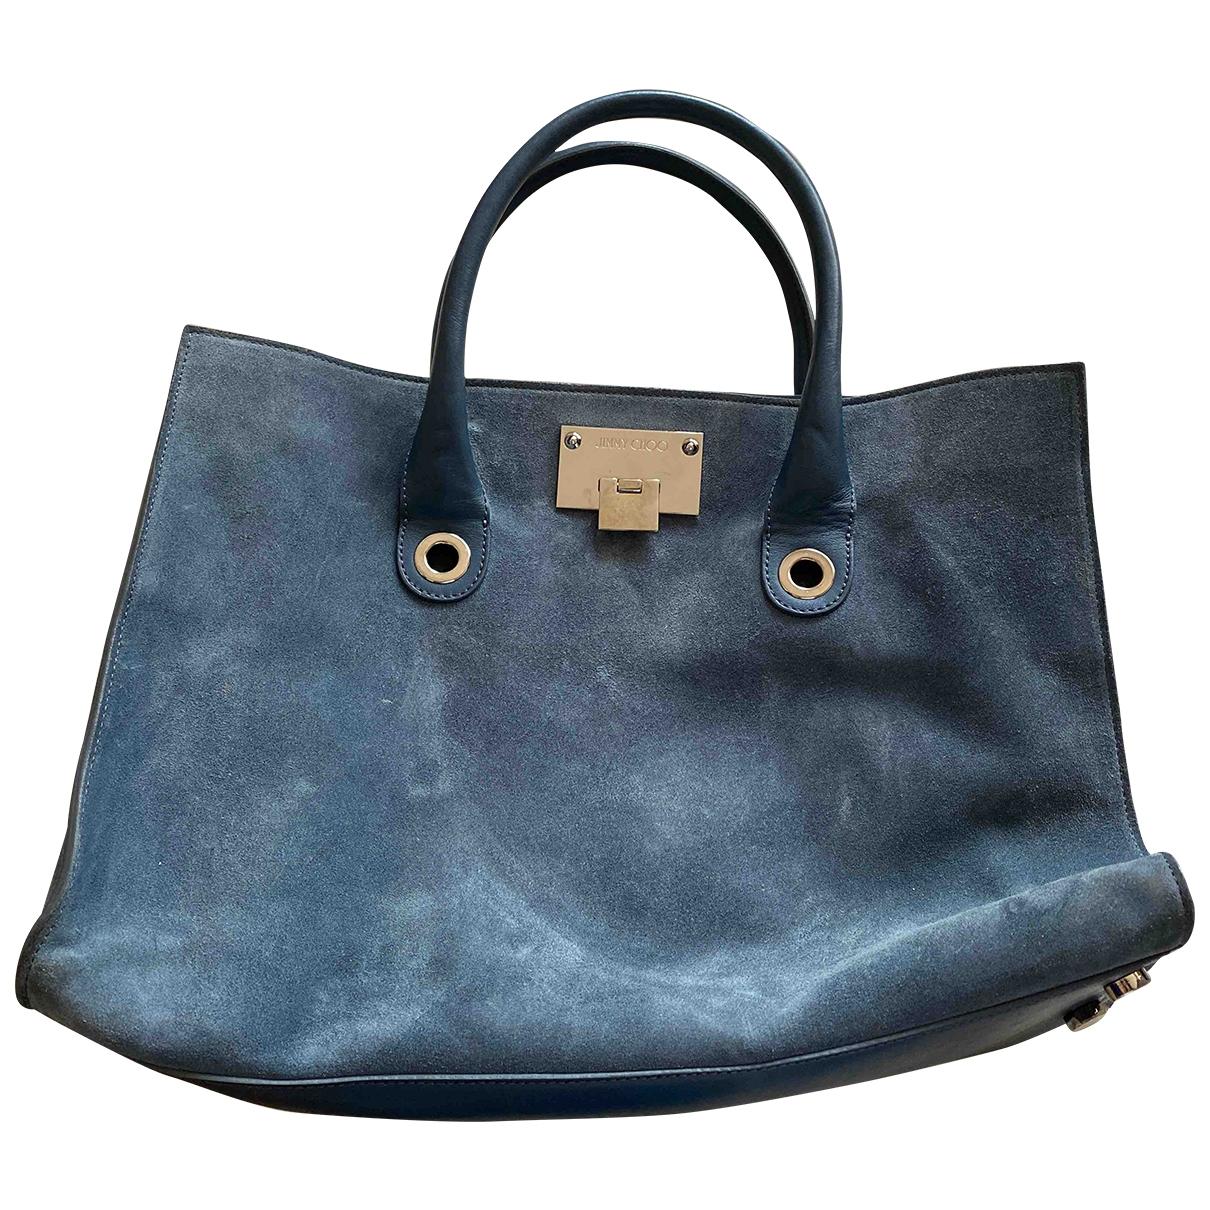 Jimmy Choo Riley Handtasche in  Blau Veloursleder